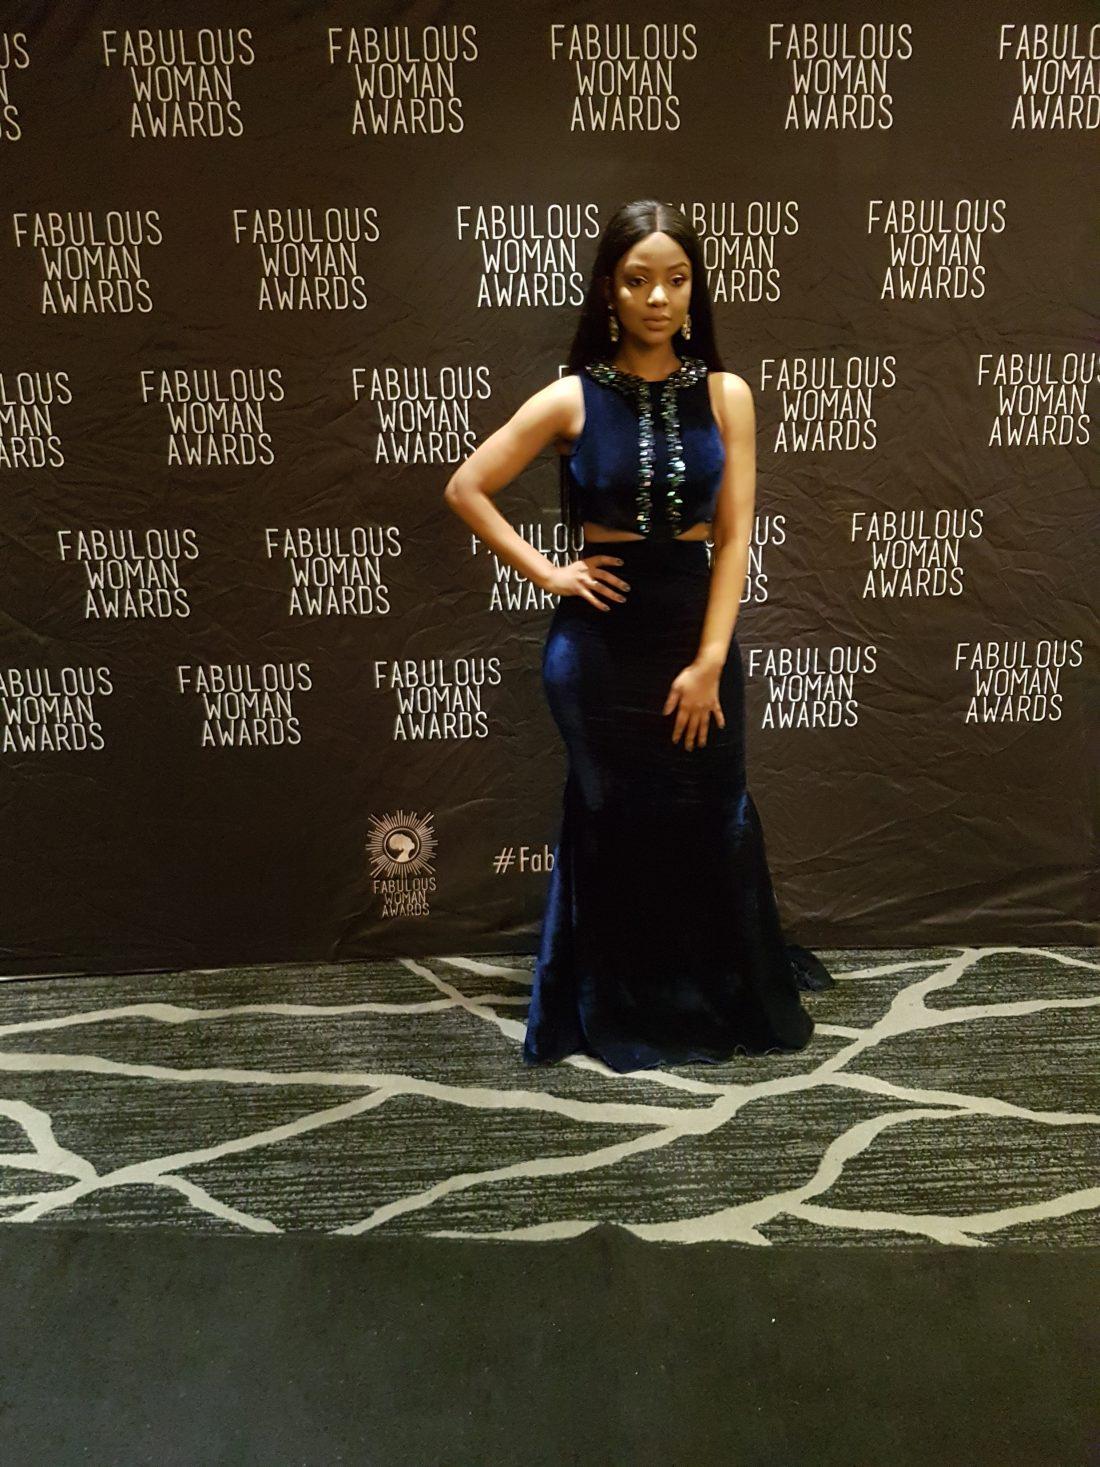 Fabulous Woman Awards Honour And Celebrate Inspirational Women